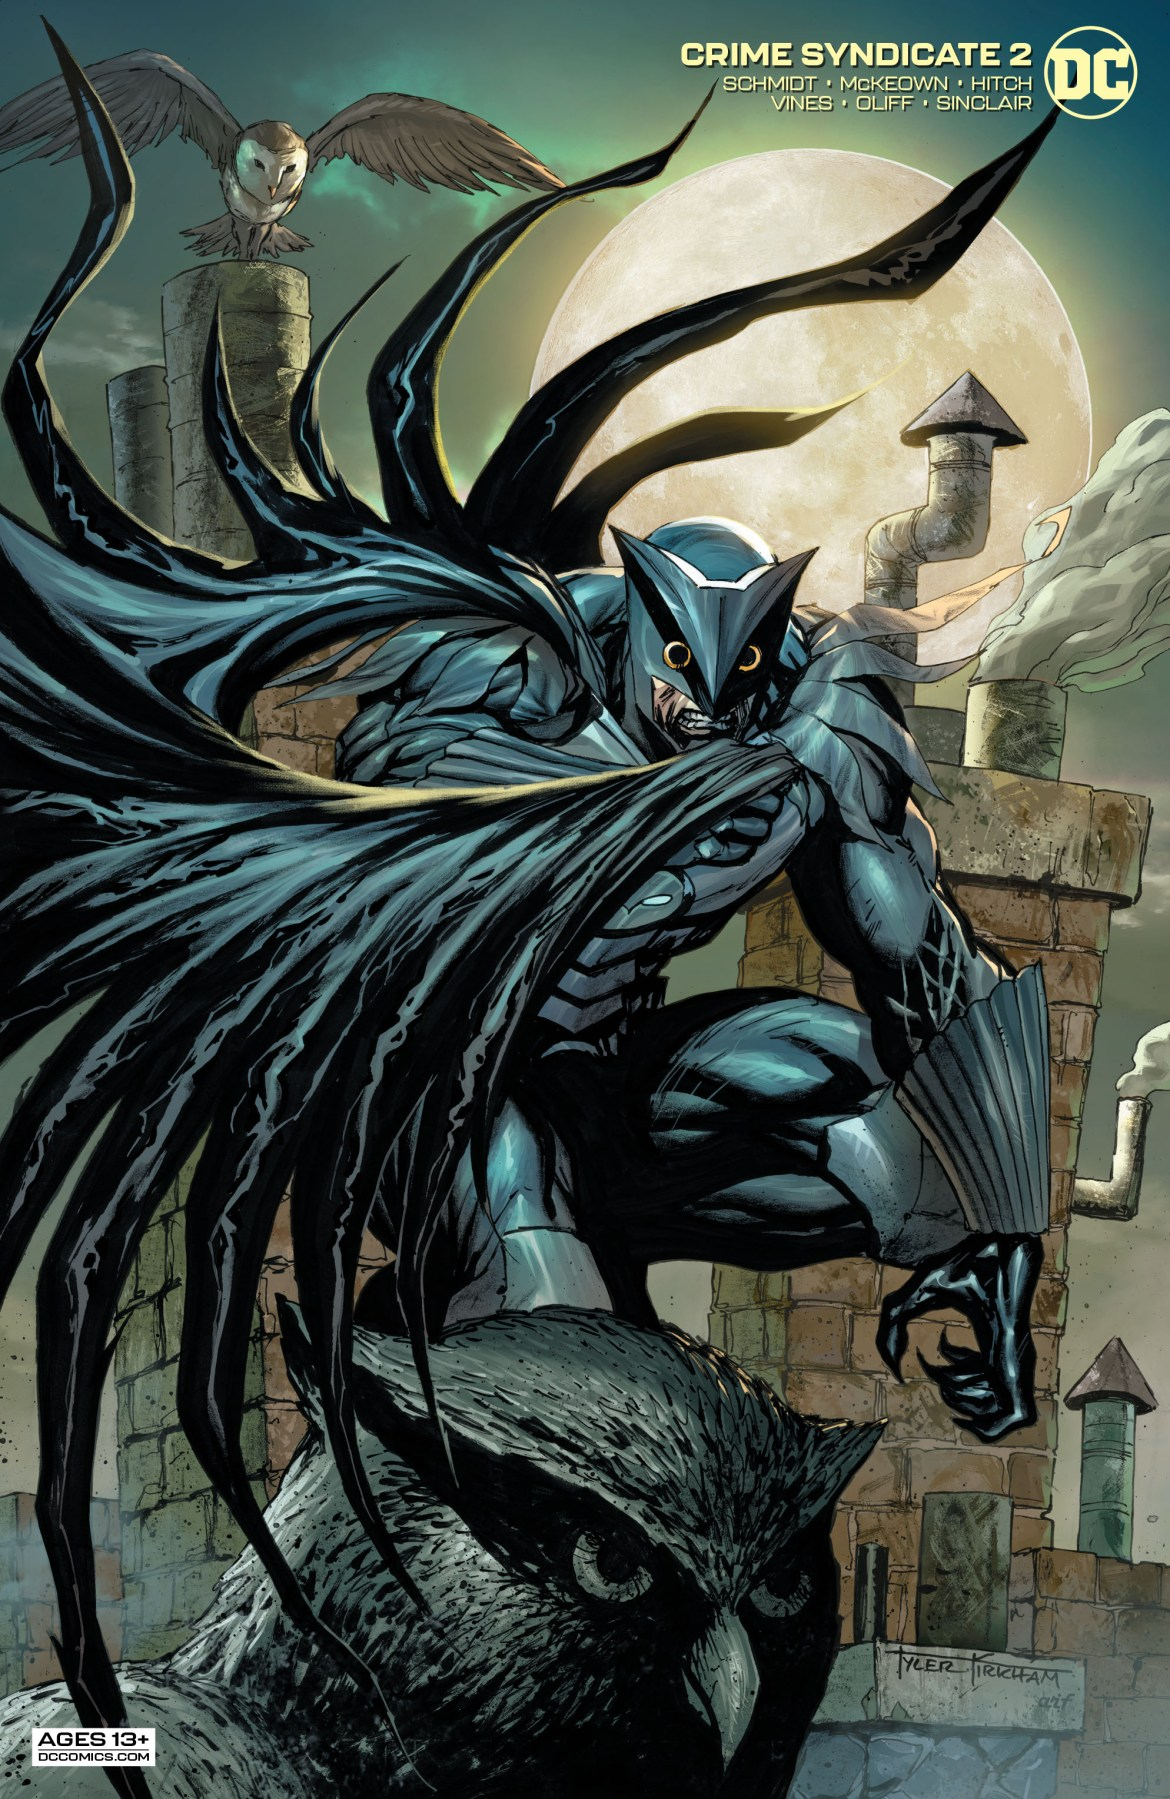 0221DC044 ComicList: DC Comics New Releases for 04/07/2021